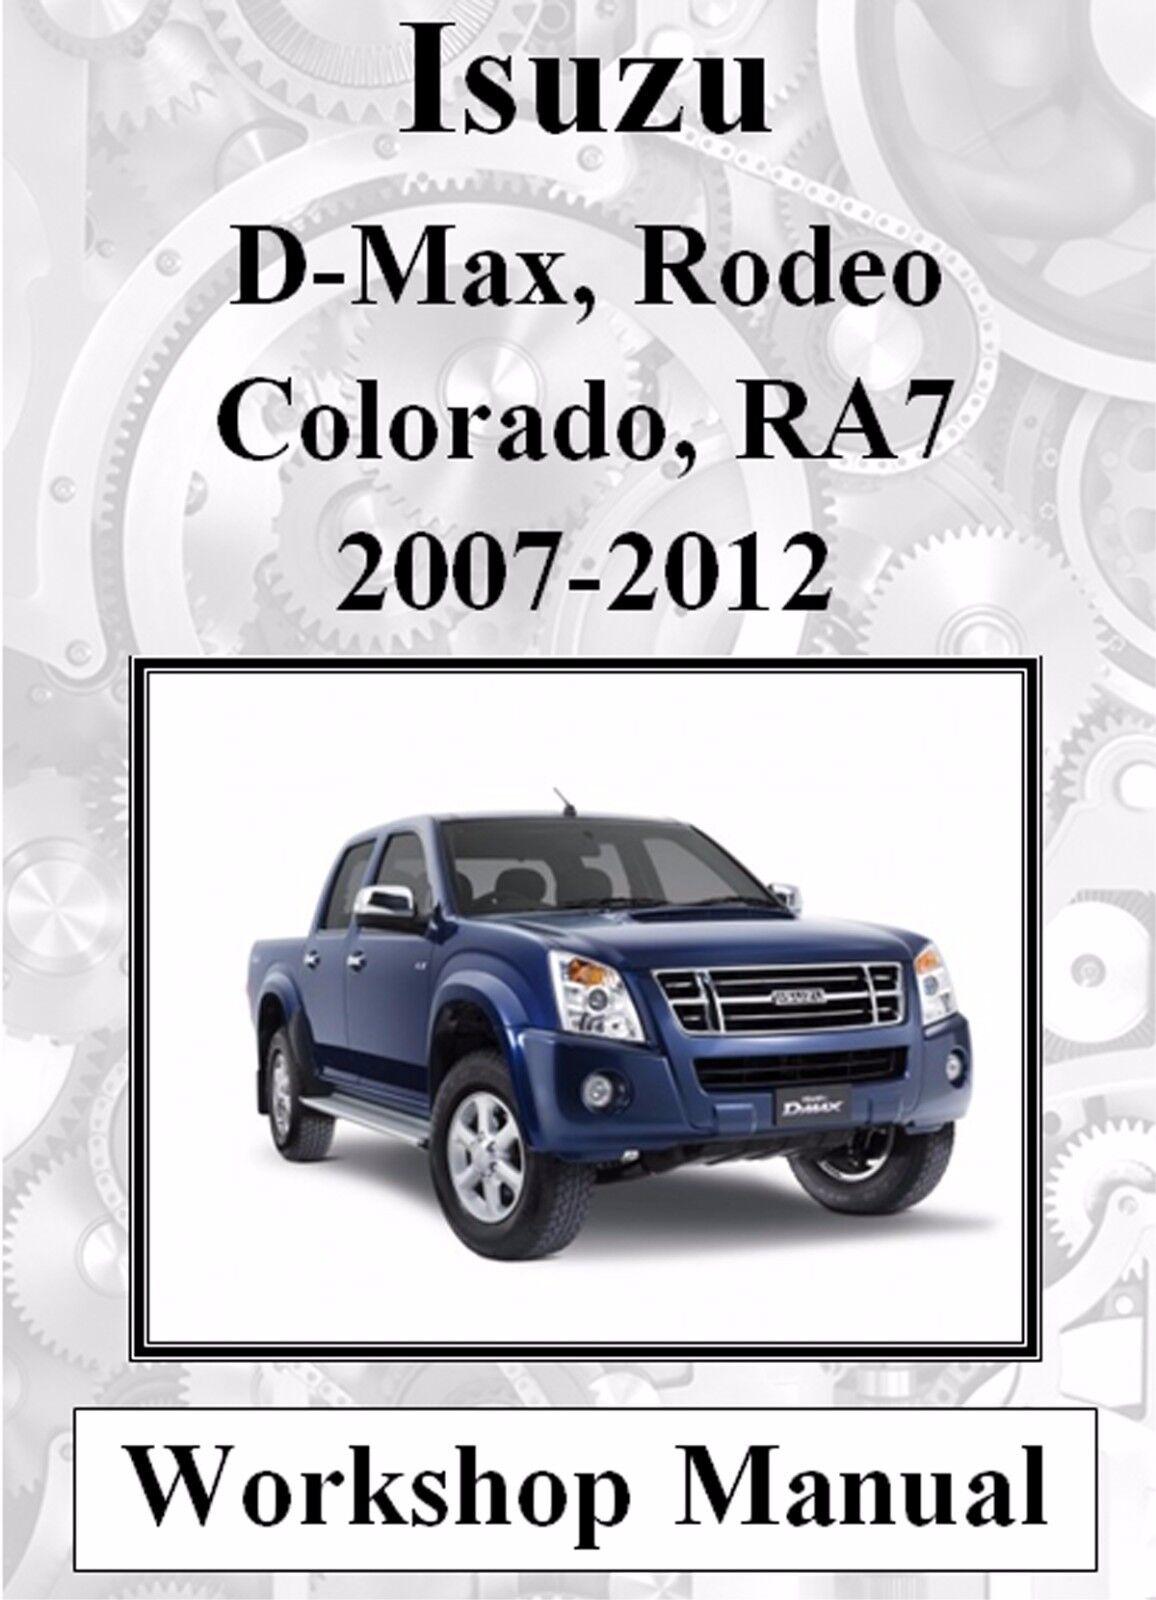 hight resolution of isuzu d max rodeo holden colorado ra7 2007 2012 workshop manual digital download ebay